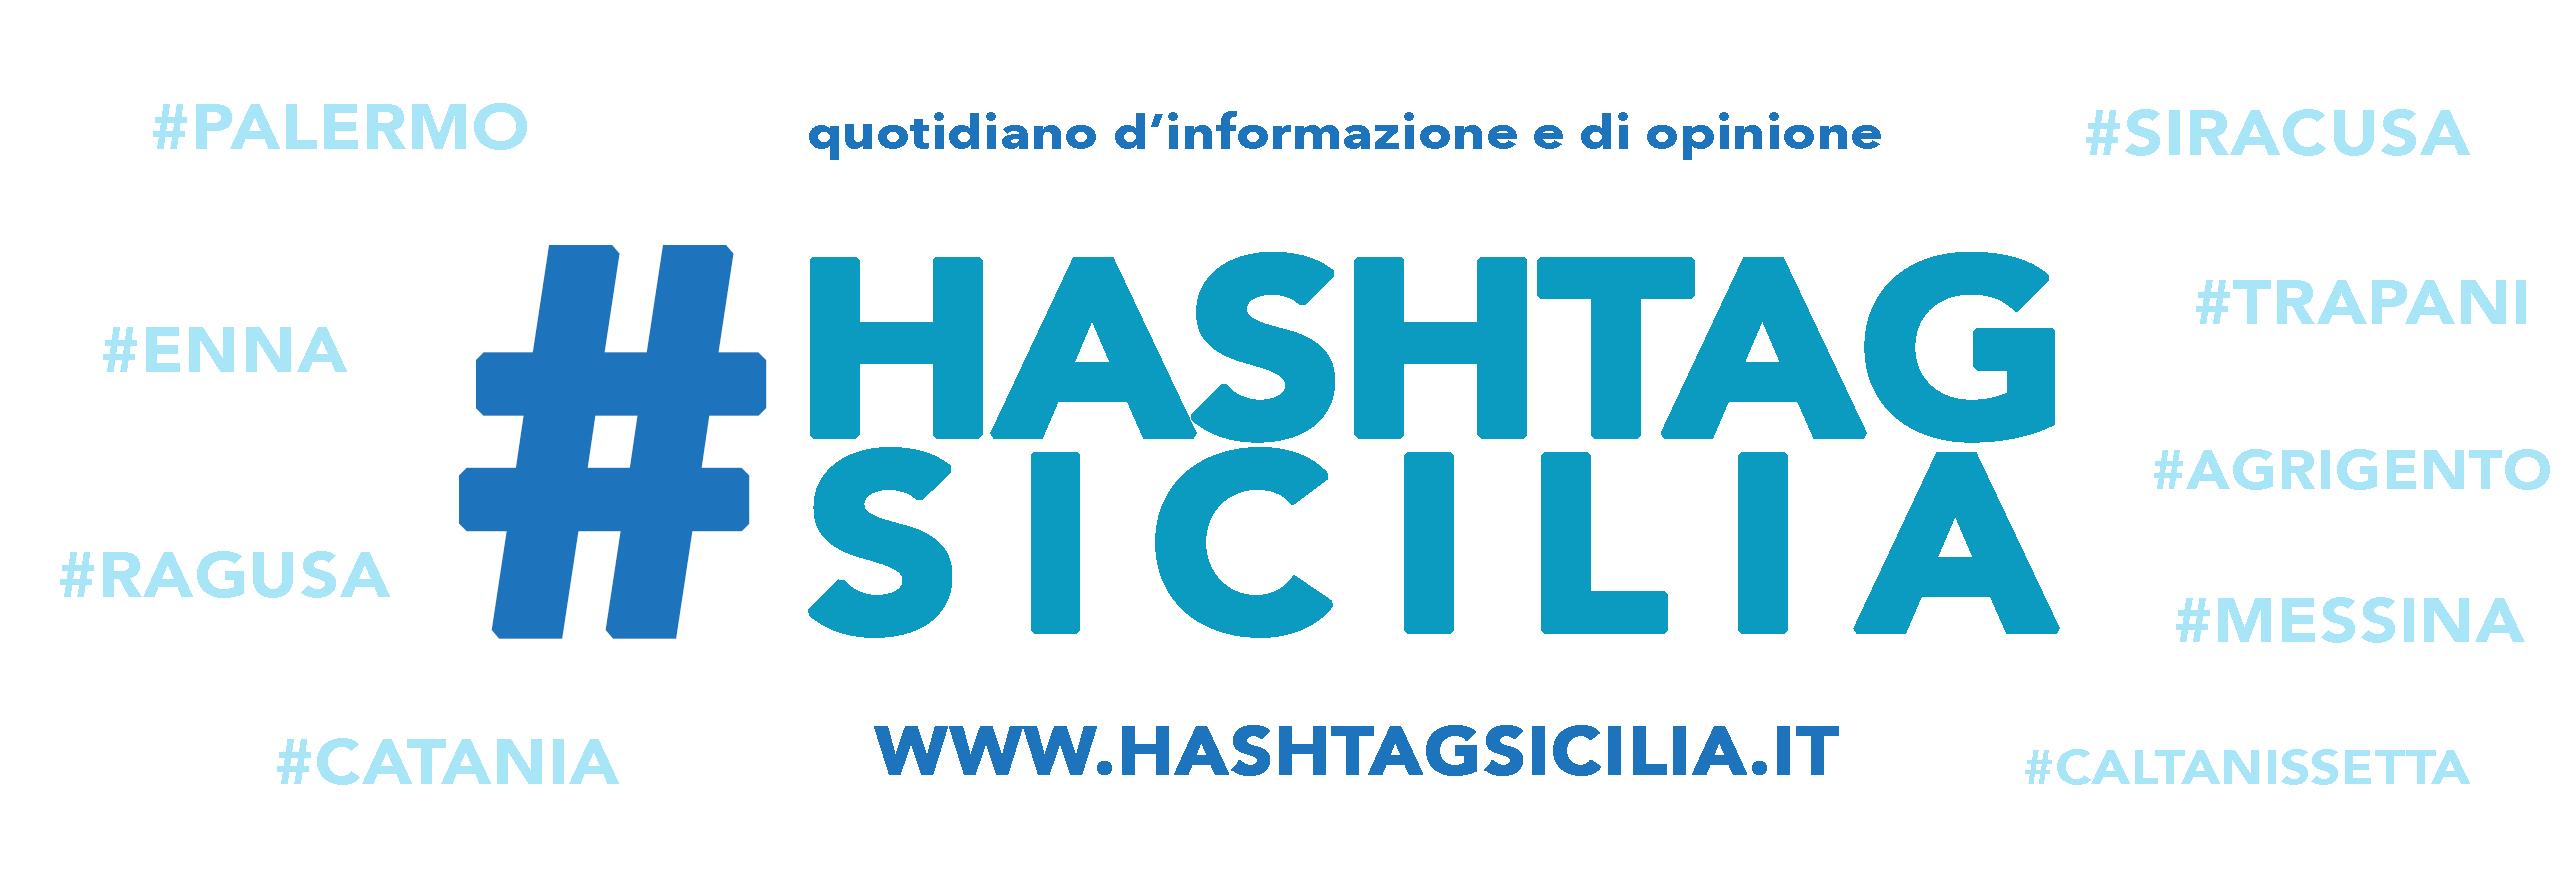 Hashtag banner sito